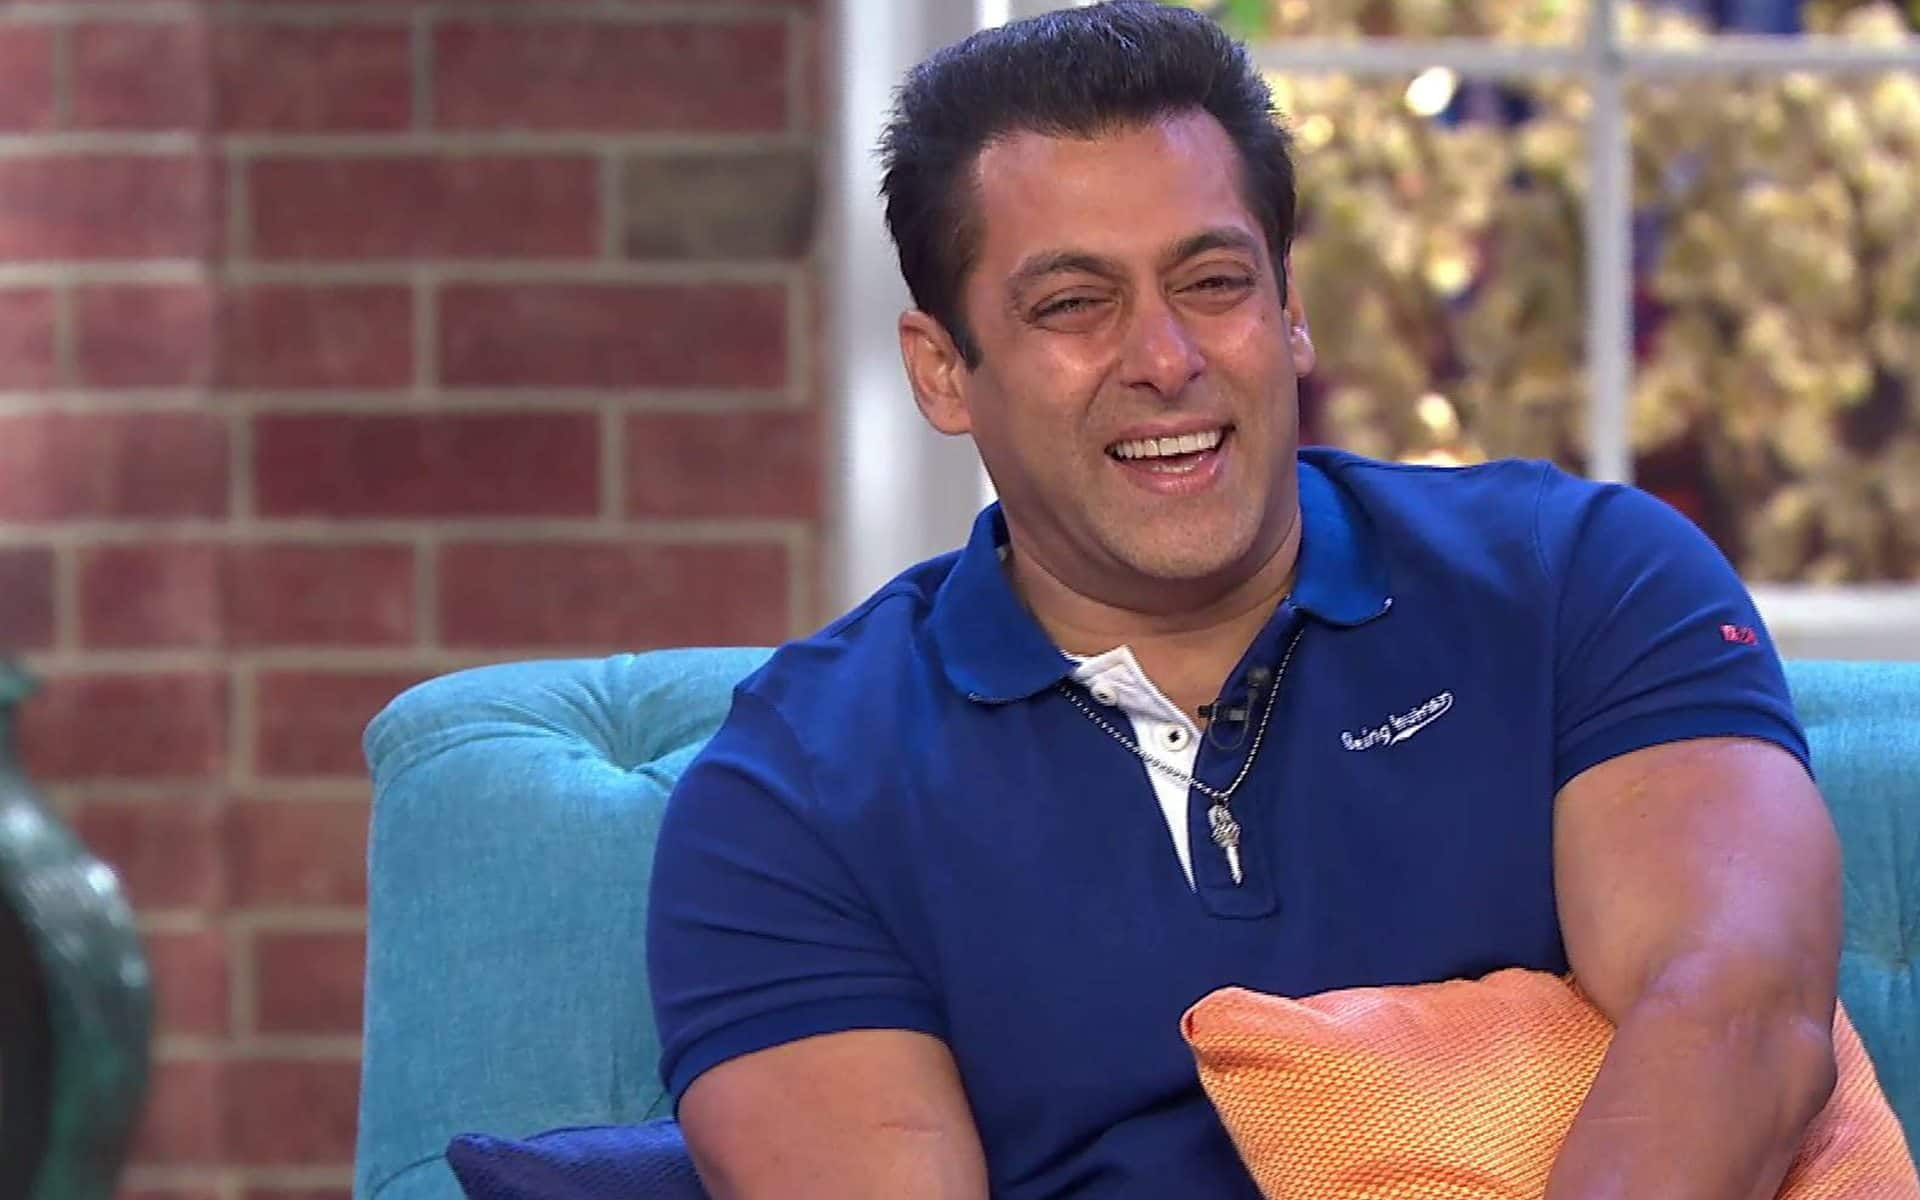 Salman-Khan-Laughing-HD-Wallpaper-02721